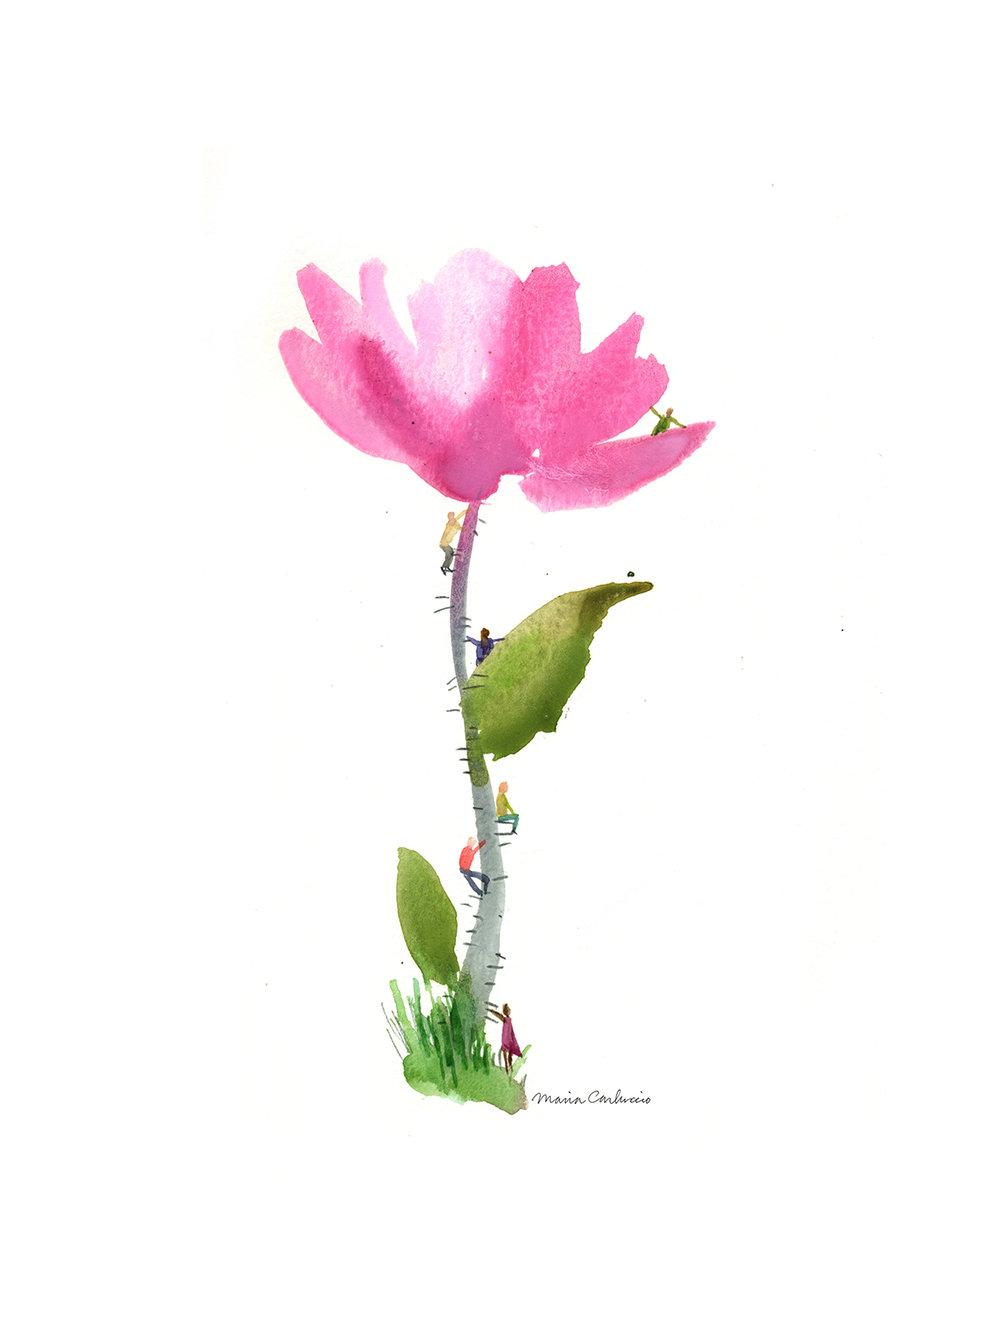 Tiny poeple on Flower_100_shop.jpg